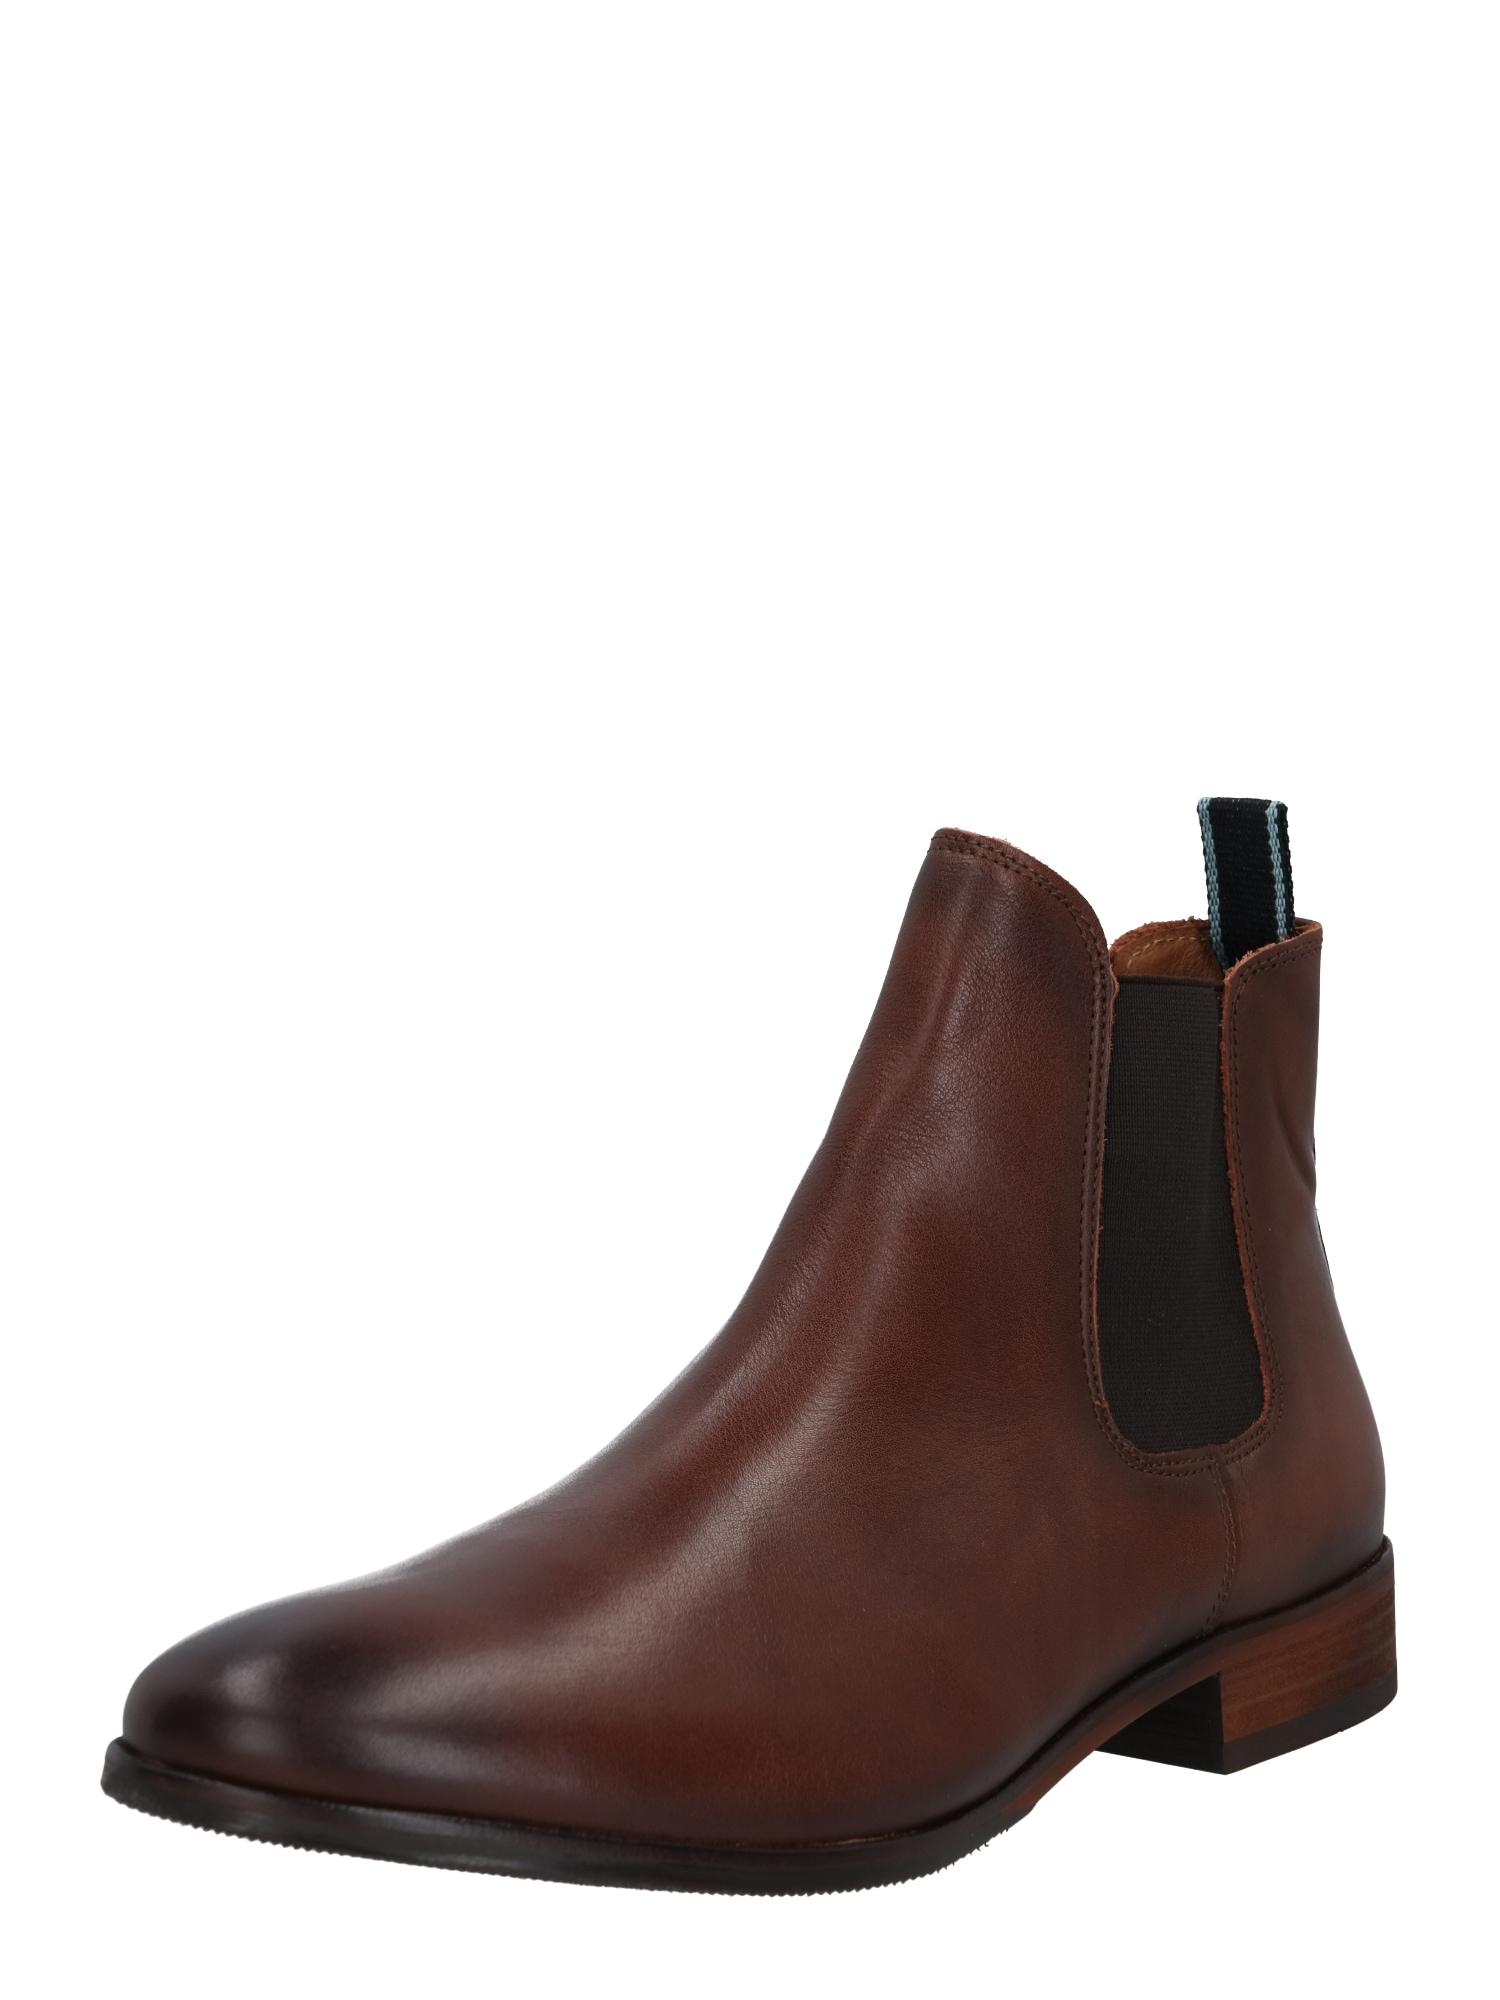 "Shoe The Bear ""Chelsea"" batai"